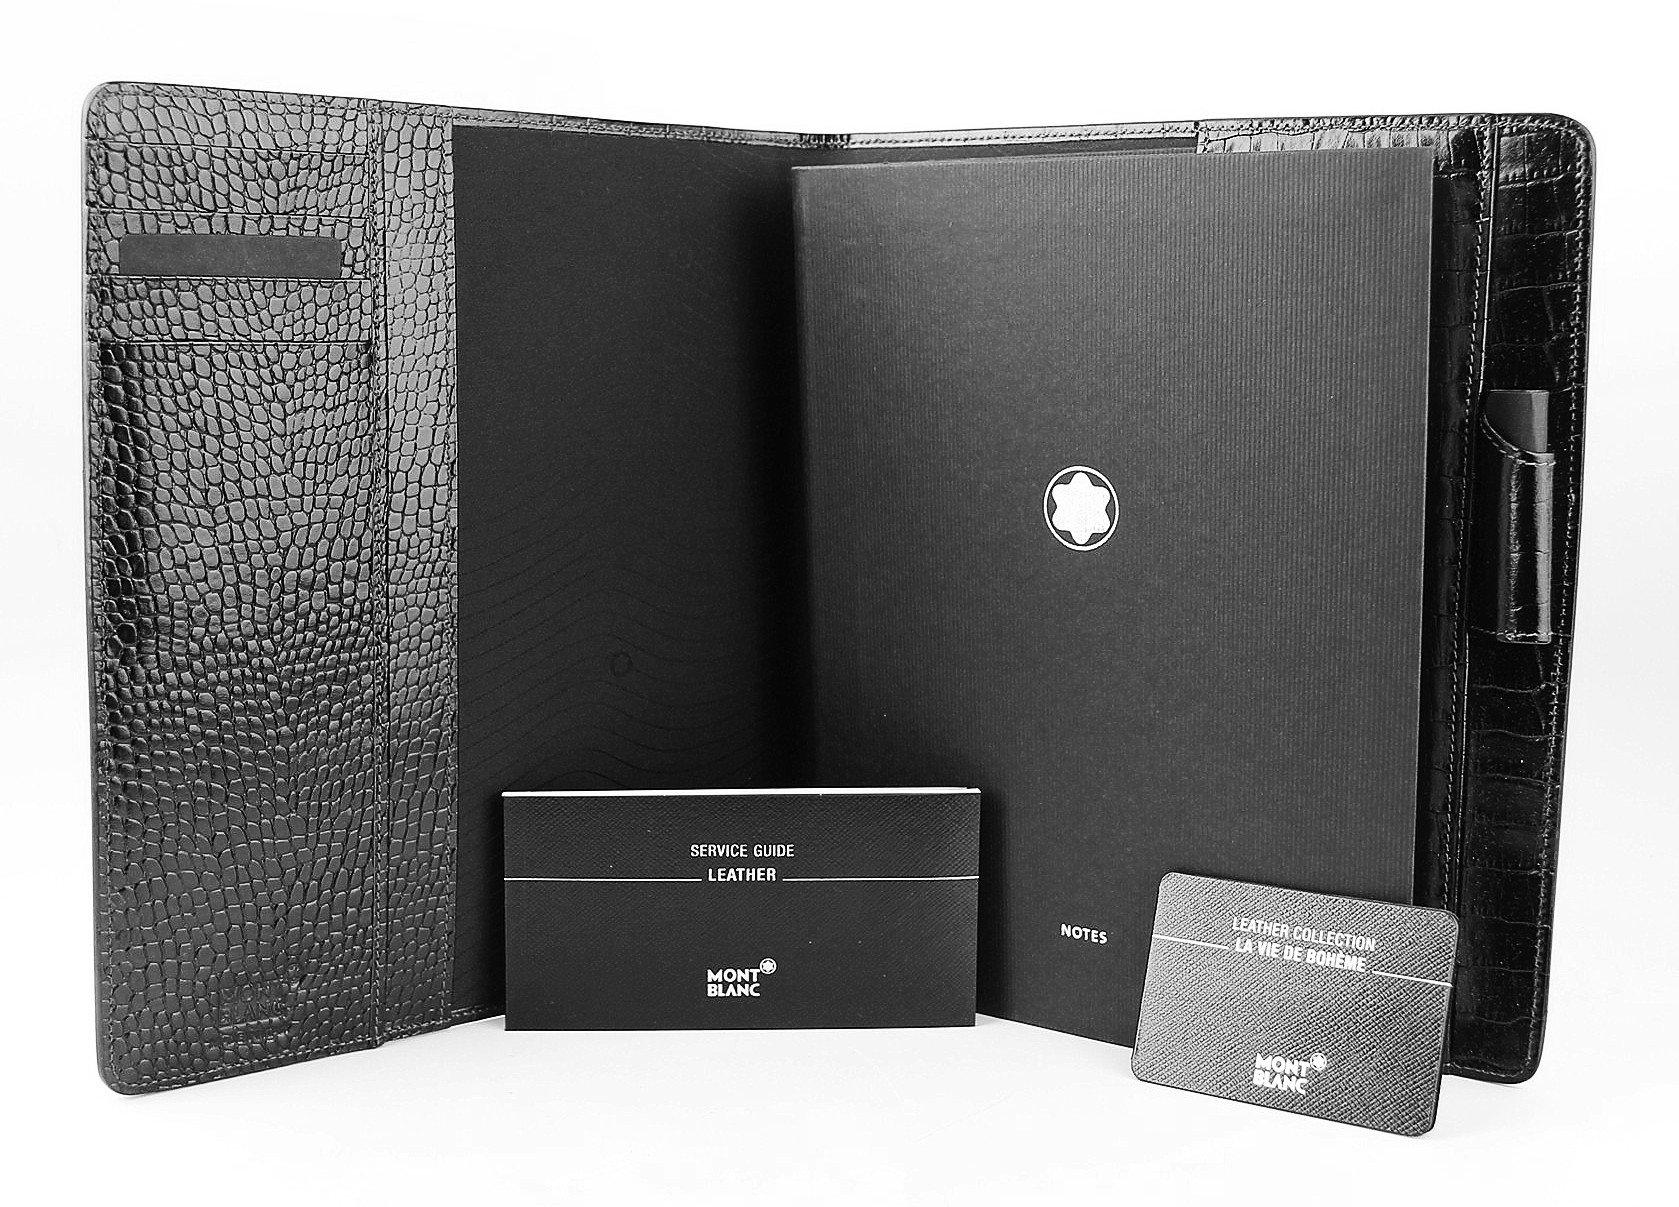 MONTBLANC LA VIE DE BOHEME 100% BLACK LEATHER MEDIUM 8''x9'' NOTEBOOK 107617 ITALY